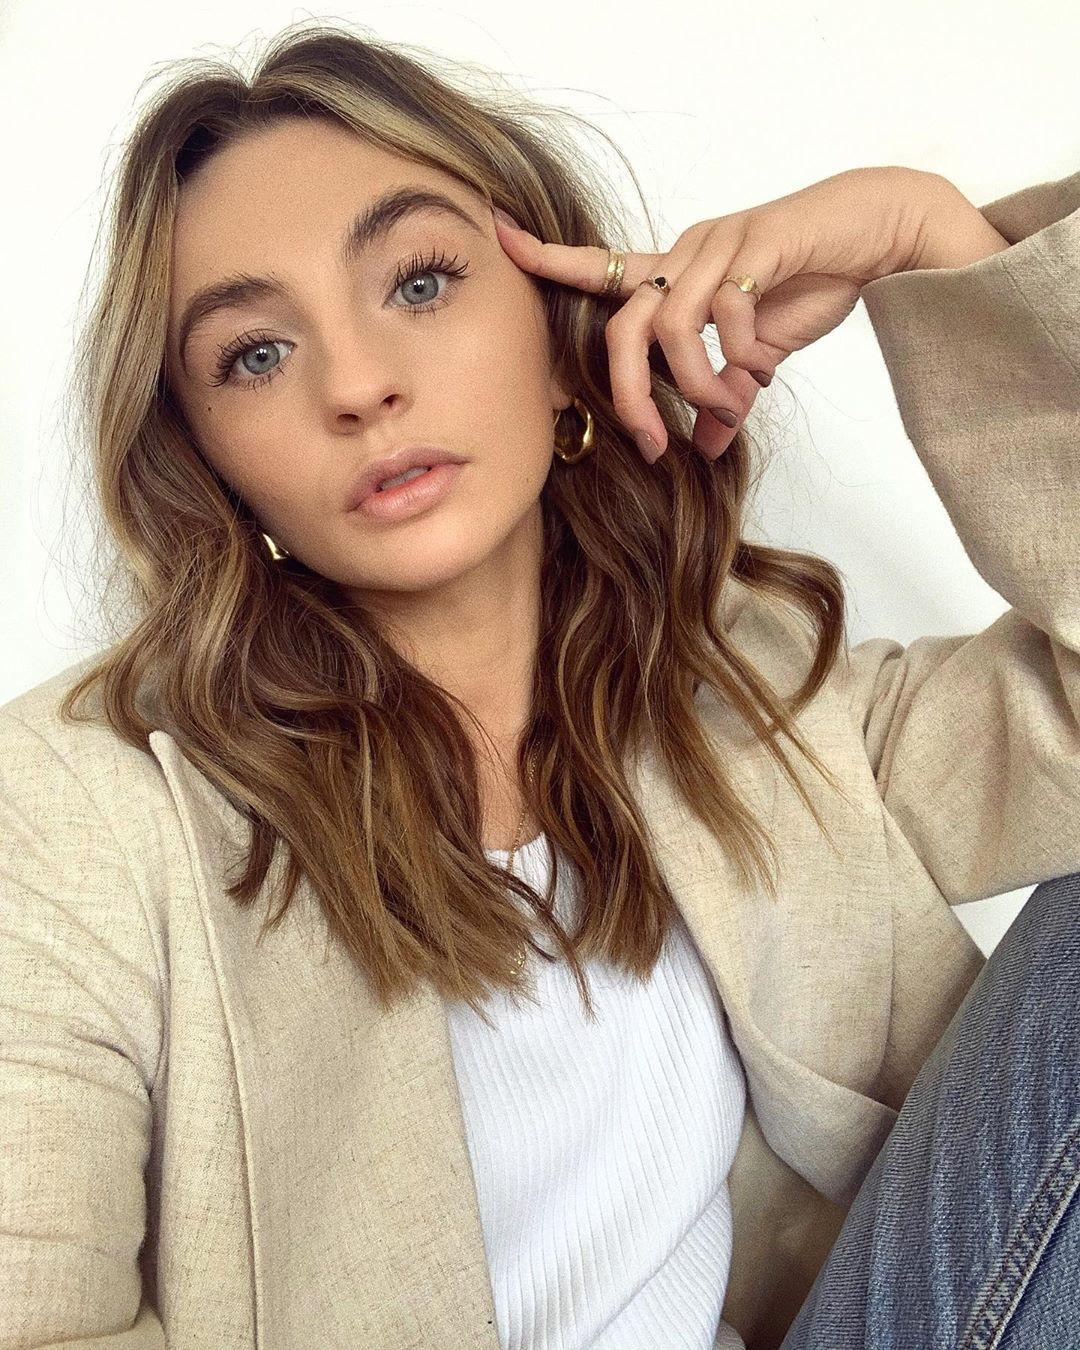 Chloe-Hayward-Wallpapers-Insta-Fit-Bio-10